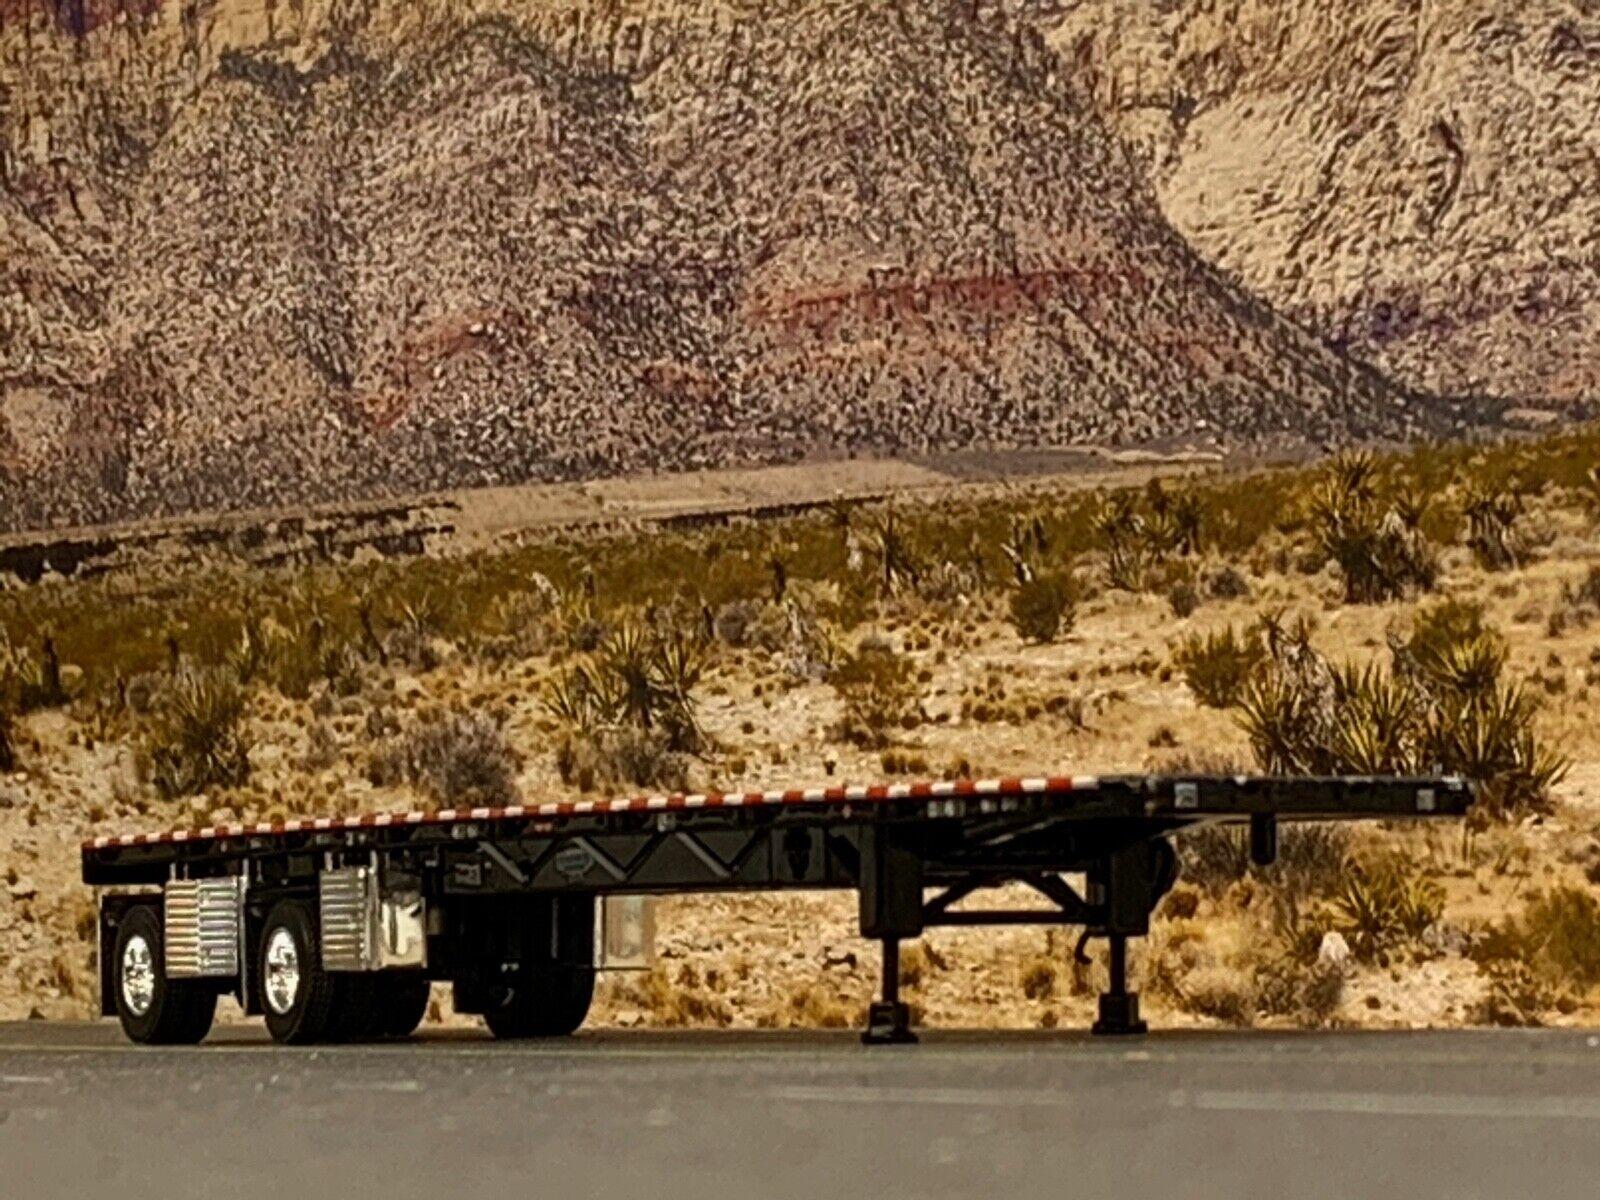 1/64 DCP BLACK WILSON ROADBRUTE SPREAD AXLE FLATBED TRAILER W/ WHEEL & TOOL BOX 1